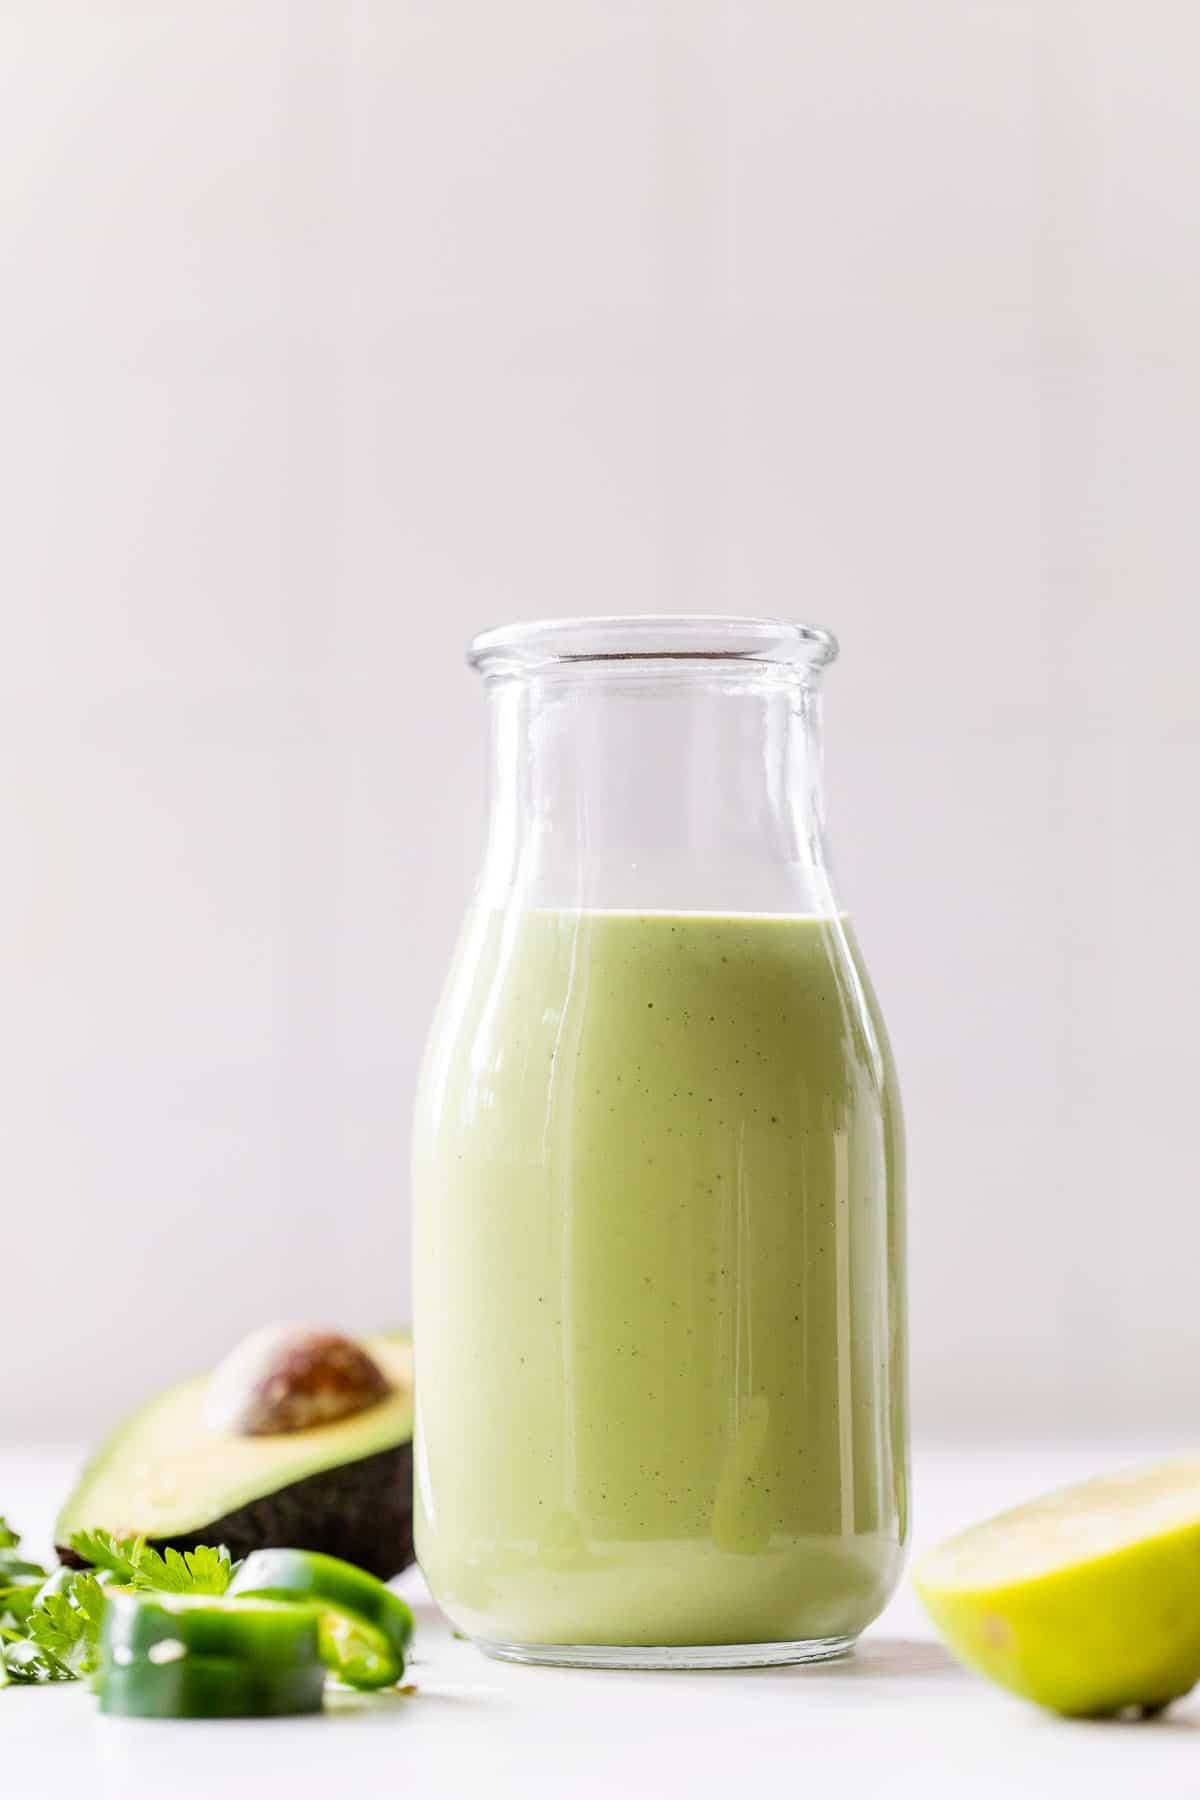 tall jar of green avocado dressing beside half an avocado